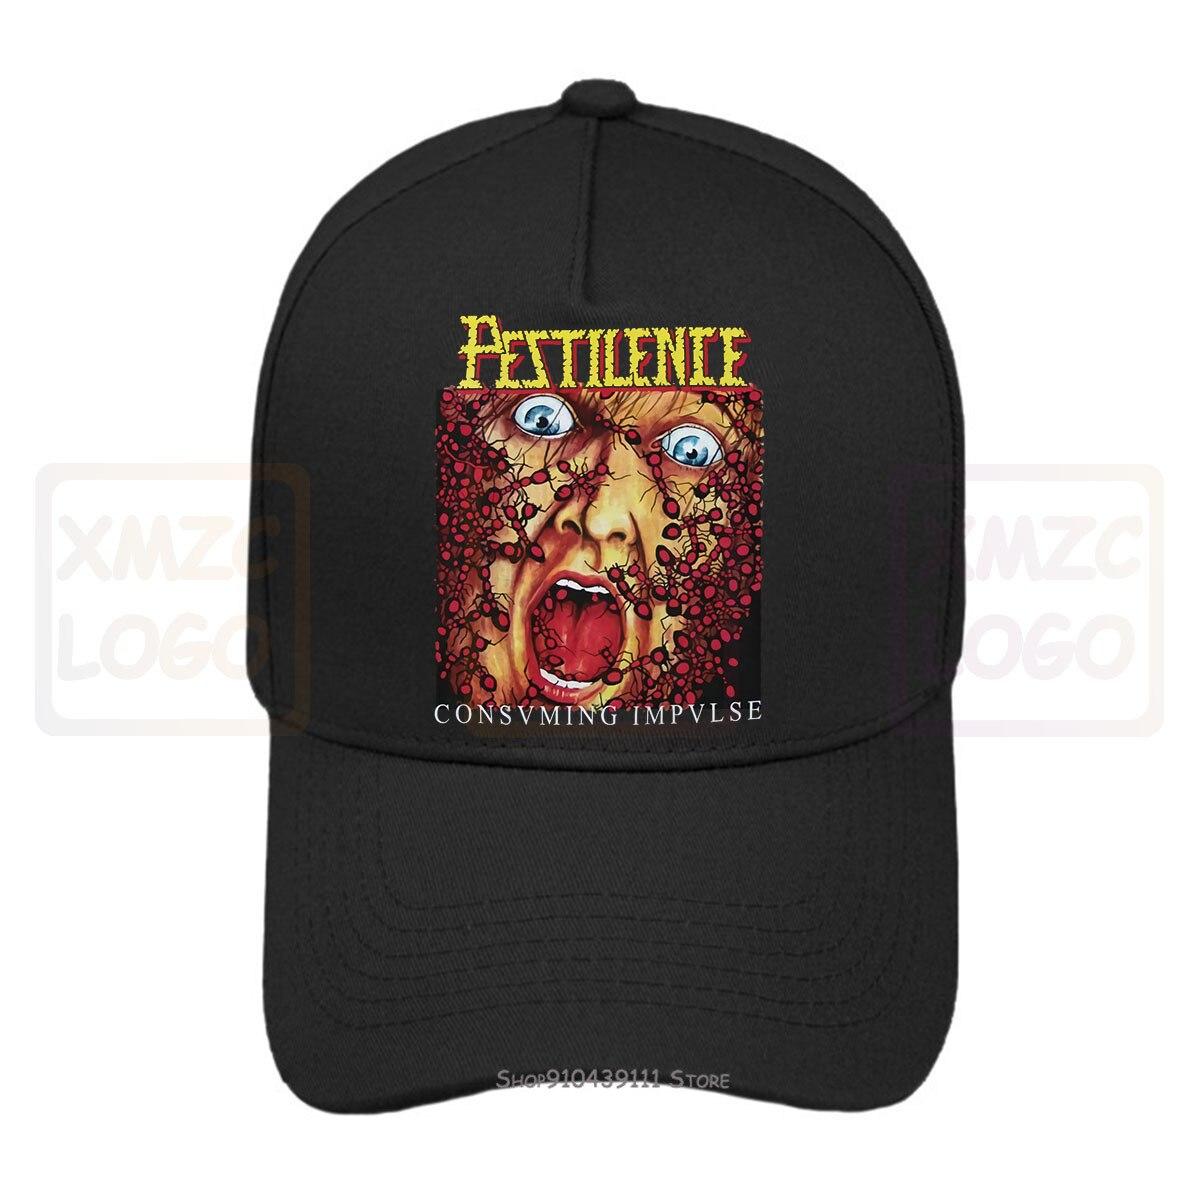 Pestilence Atmungsaktives Impulse - Dutch Death Metal - Thrash Metal бейсболка головные уборы для женщин и мужчин